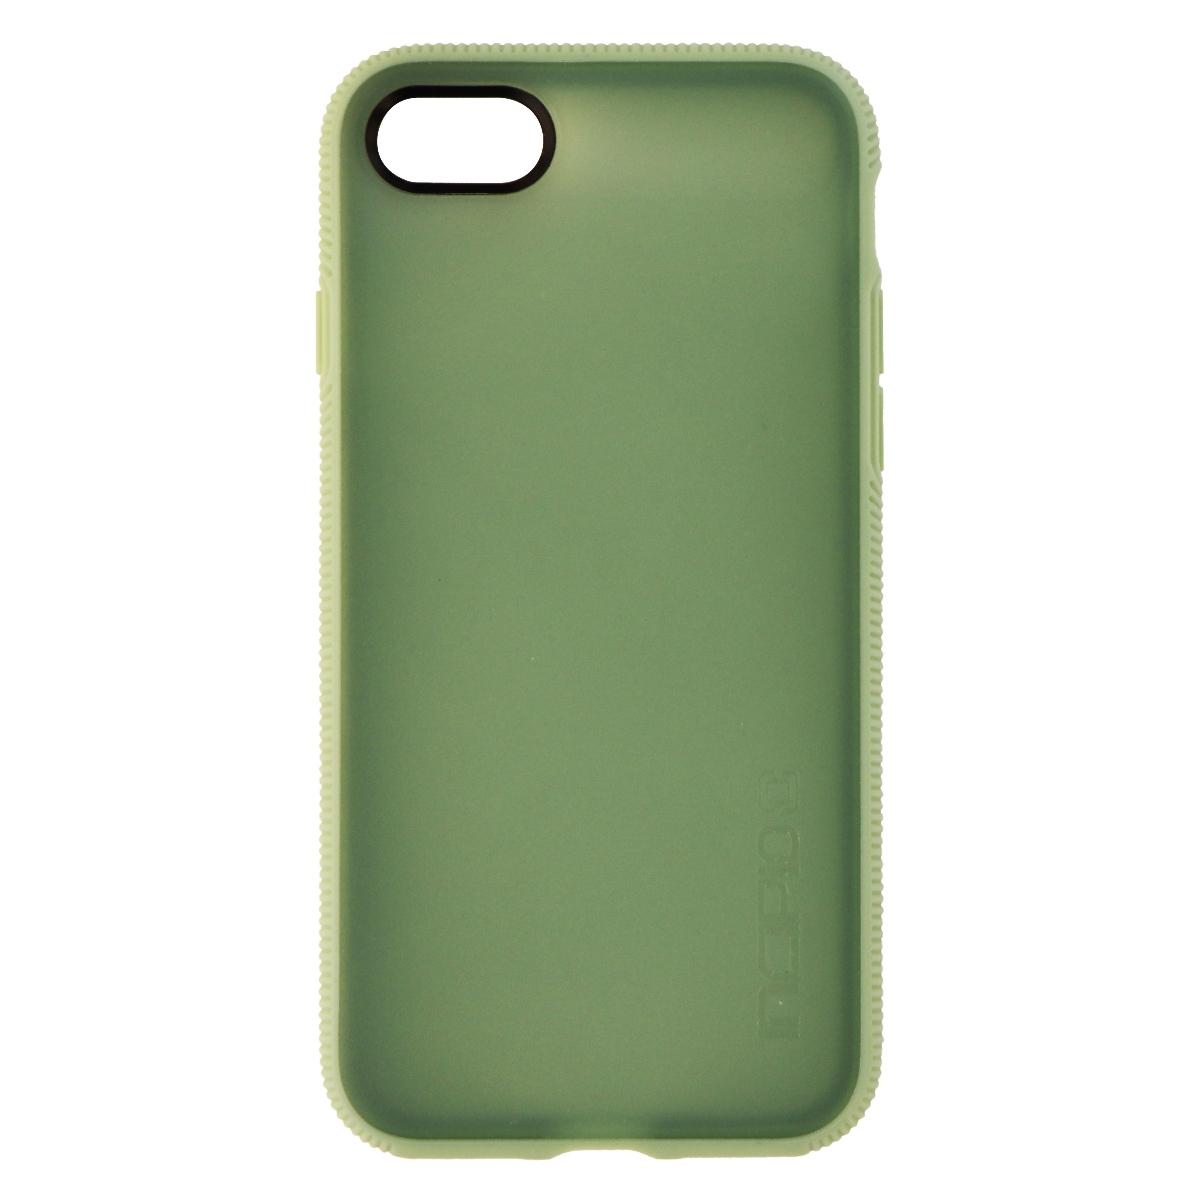 Incipio Octane Series Protective Case Cover for iPhone 8 7 - Green